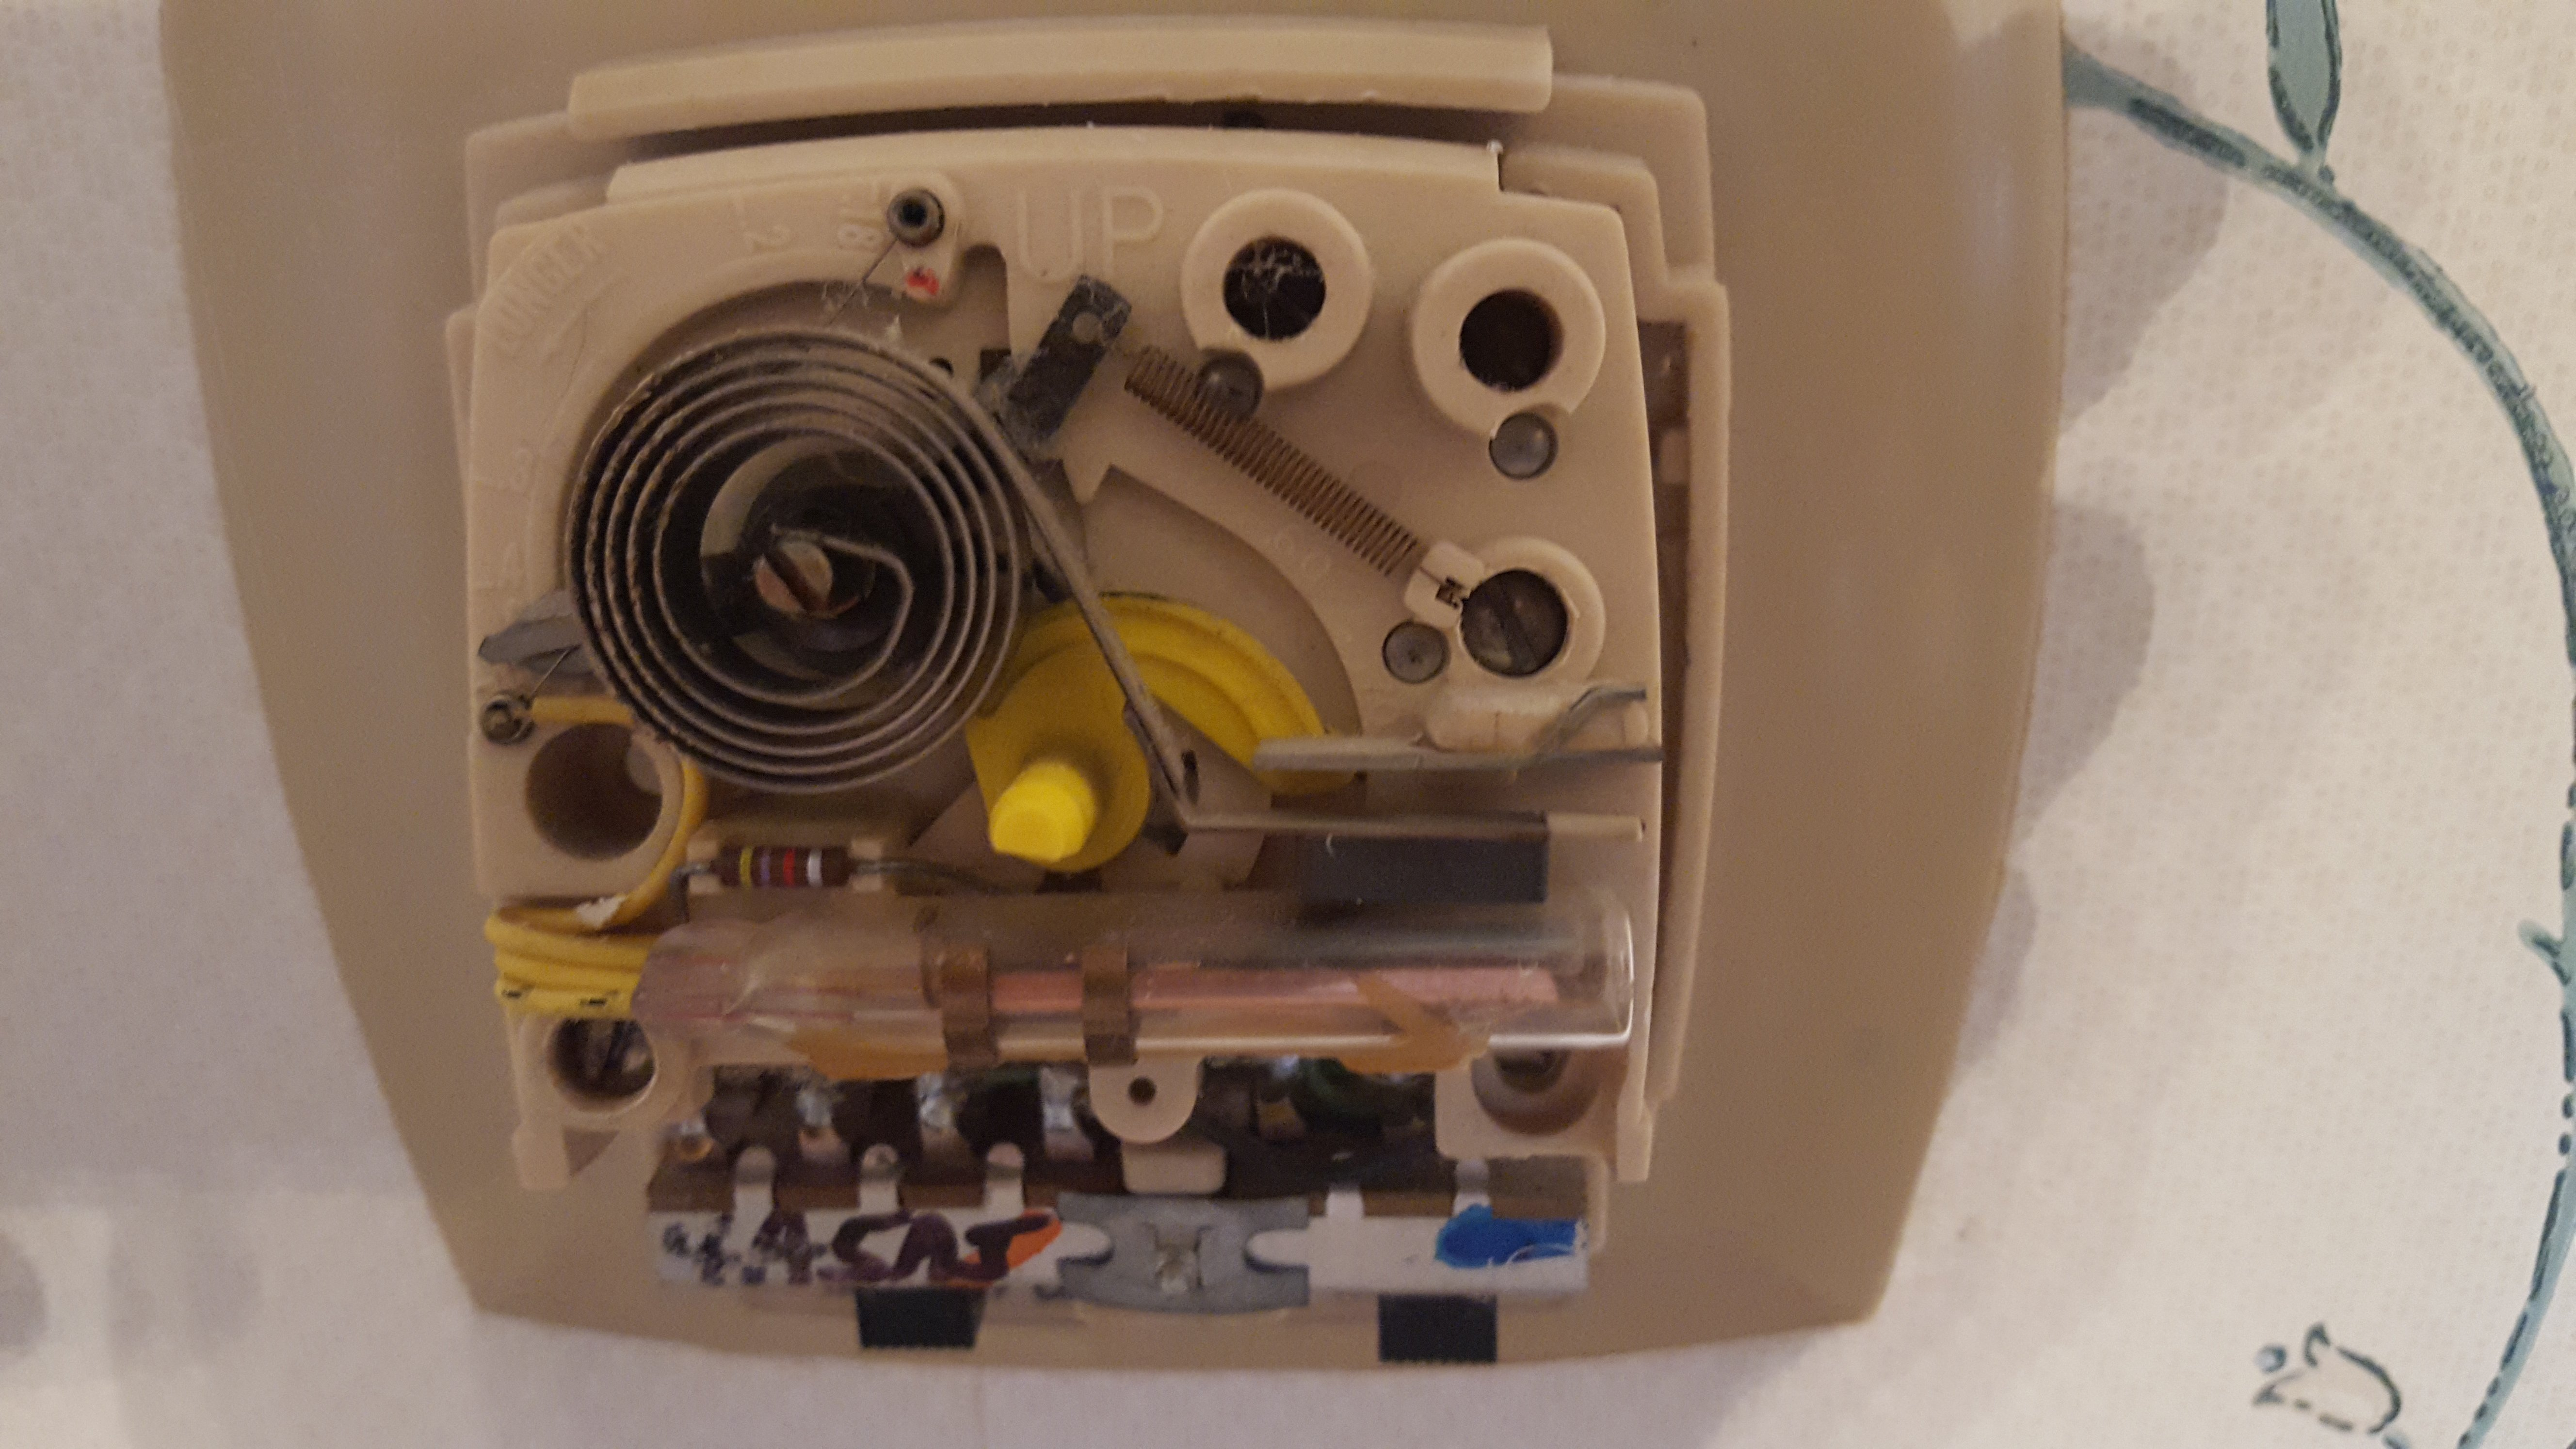 old robertshaw thermostat manual data wiring diagrams u2022 rh 207 246 69 74 robertshaw 8600 programmable thermostat manual robertshaw thermostat 8600 manual